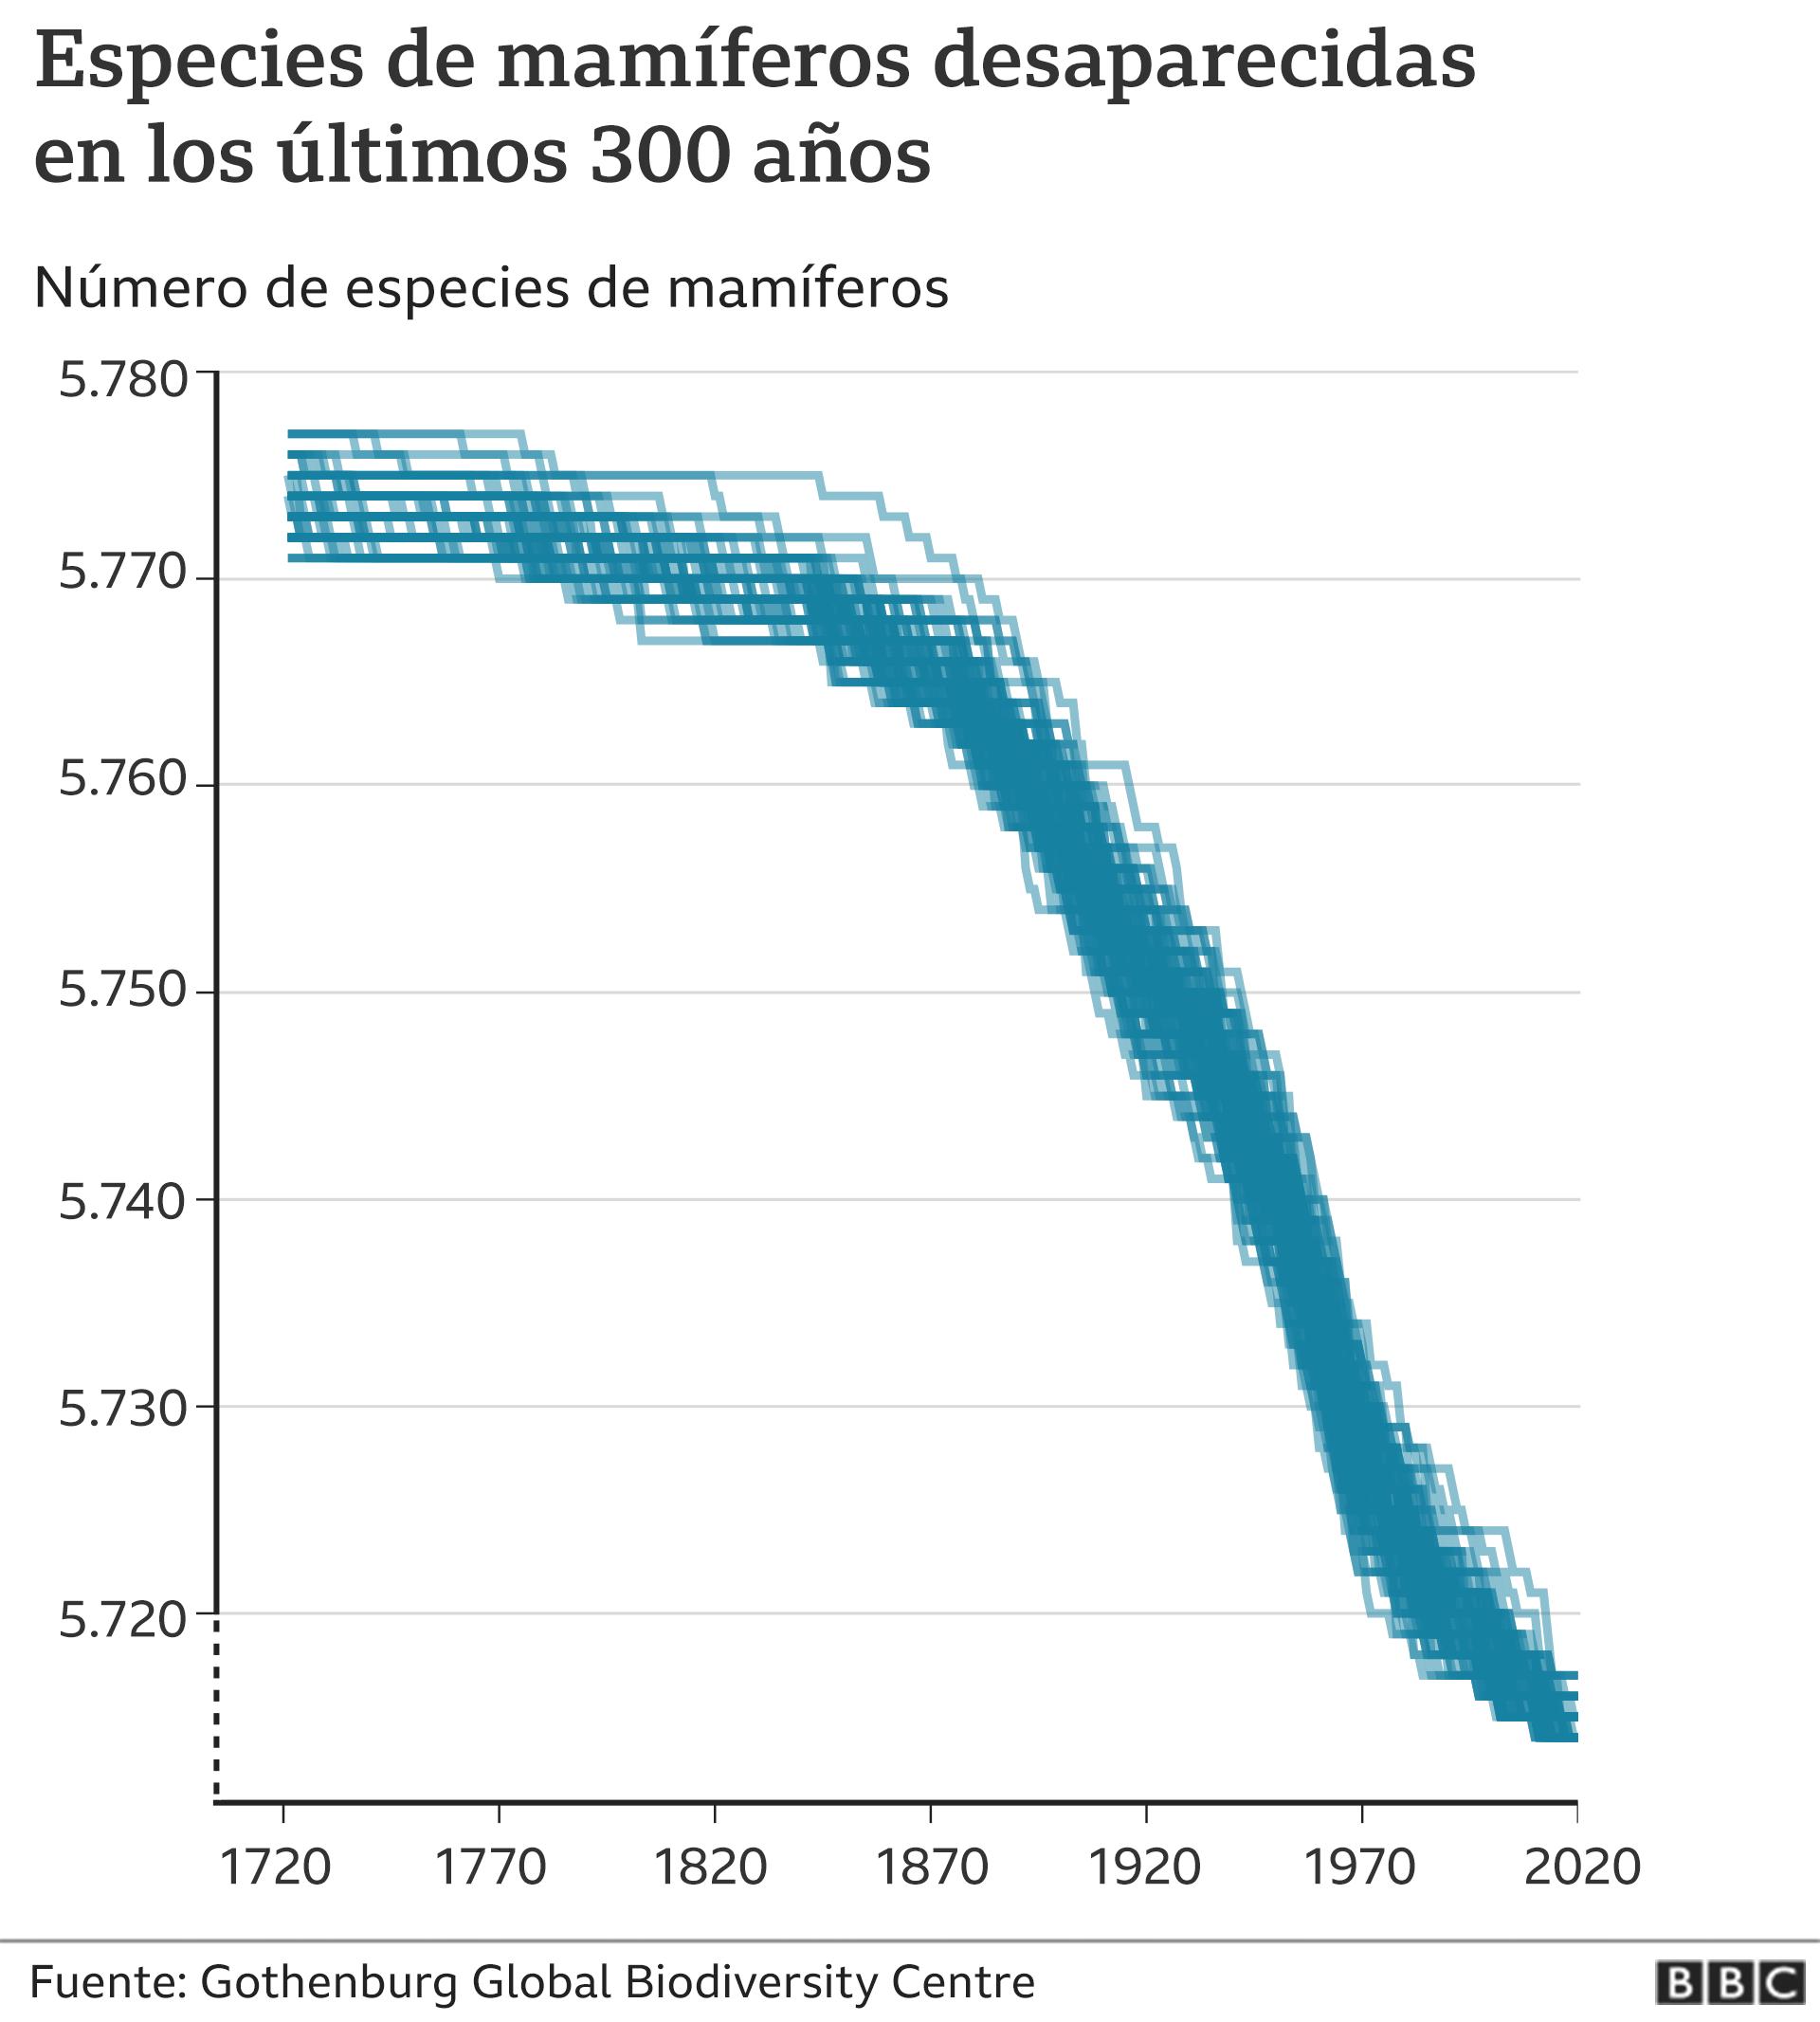 Especies de mamíferos desaparecidas: gráfico.